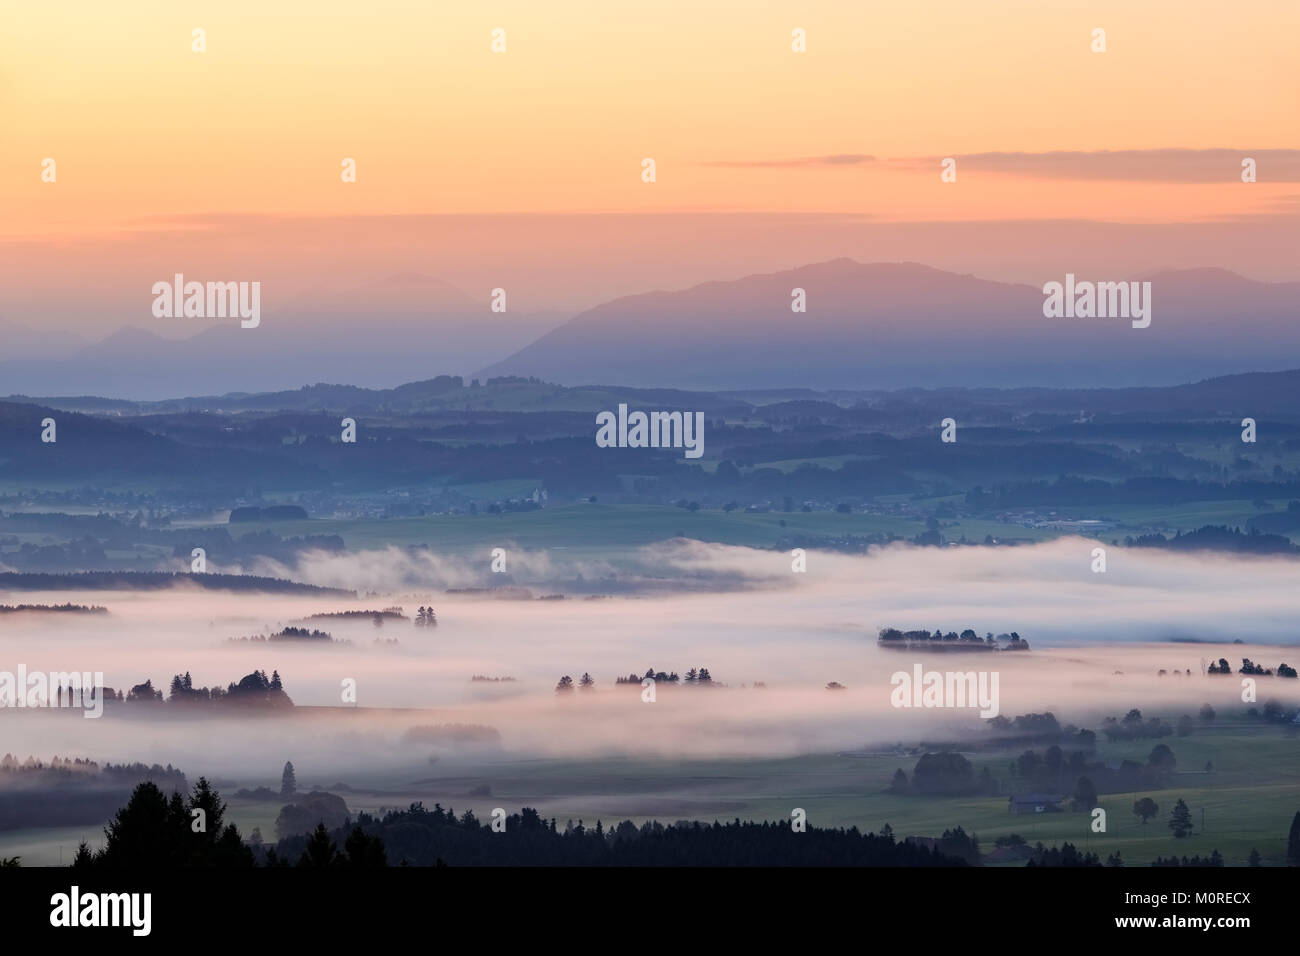 Sonnenaufgang, Nebel über dem Lechtal, Ausblick vom Auerberg bei Bernbeuren, Pfaffenwinkel, Allgäu, Oberbayern, - Stock Image